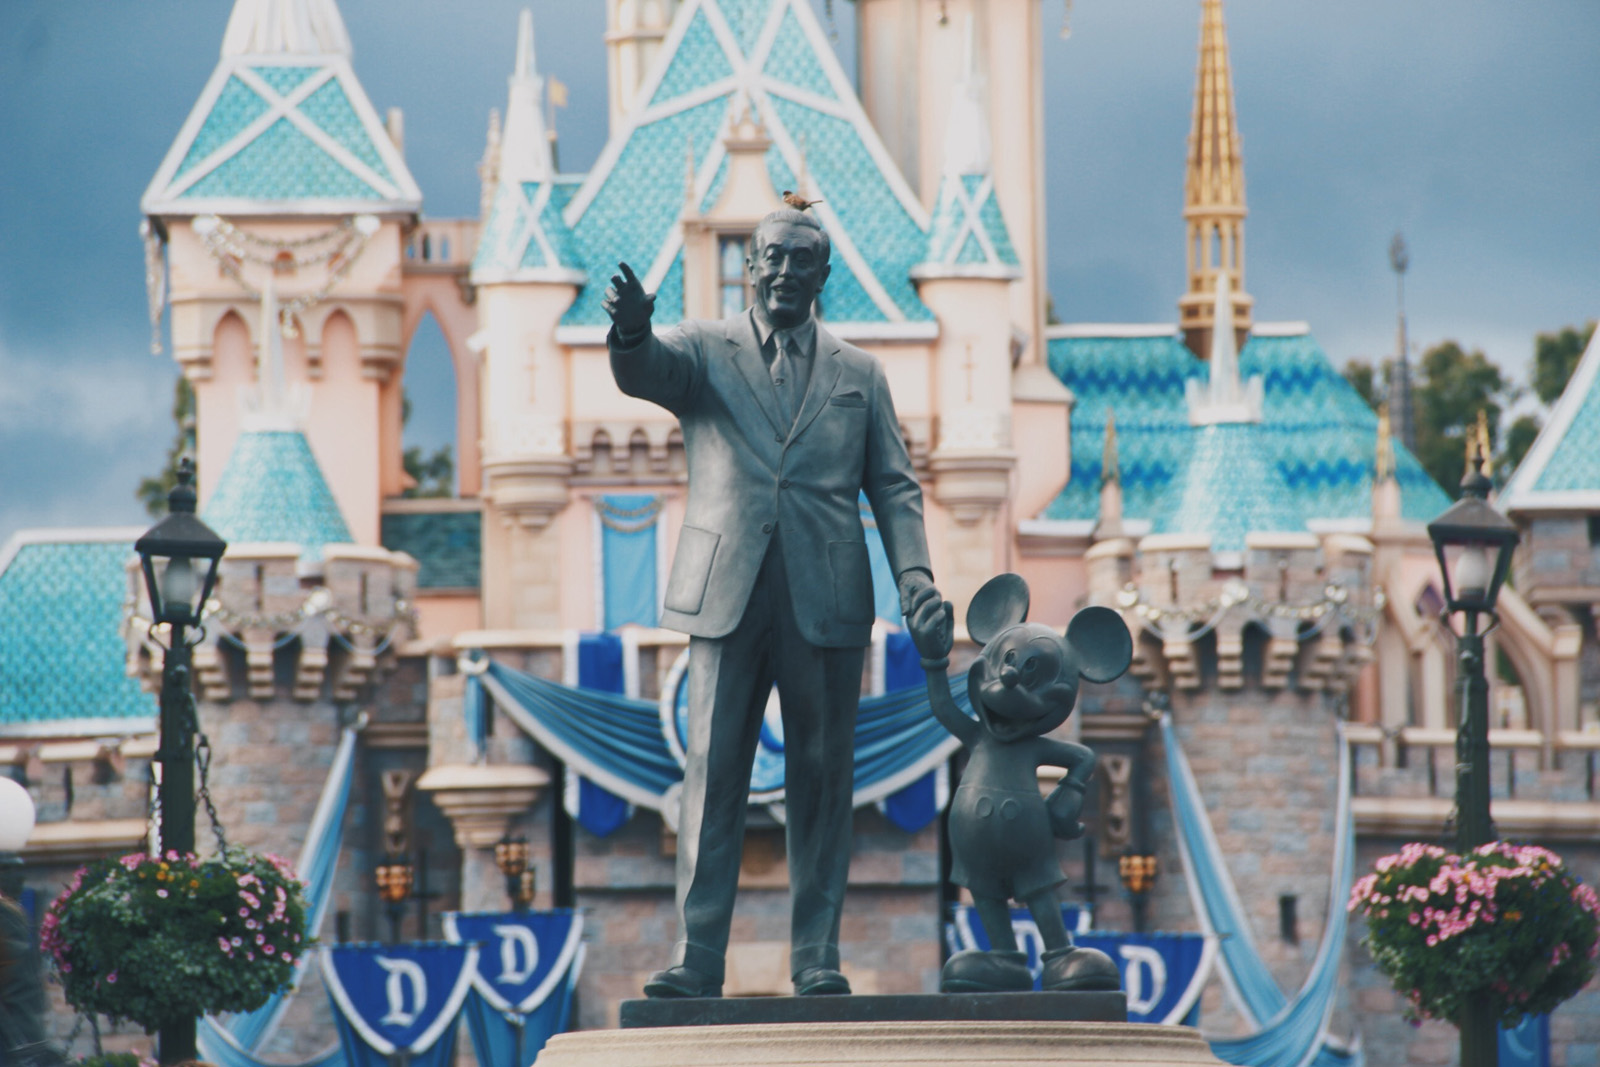 Socha Walta Disneyho v Anaheimu